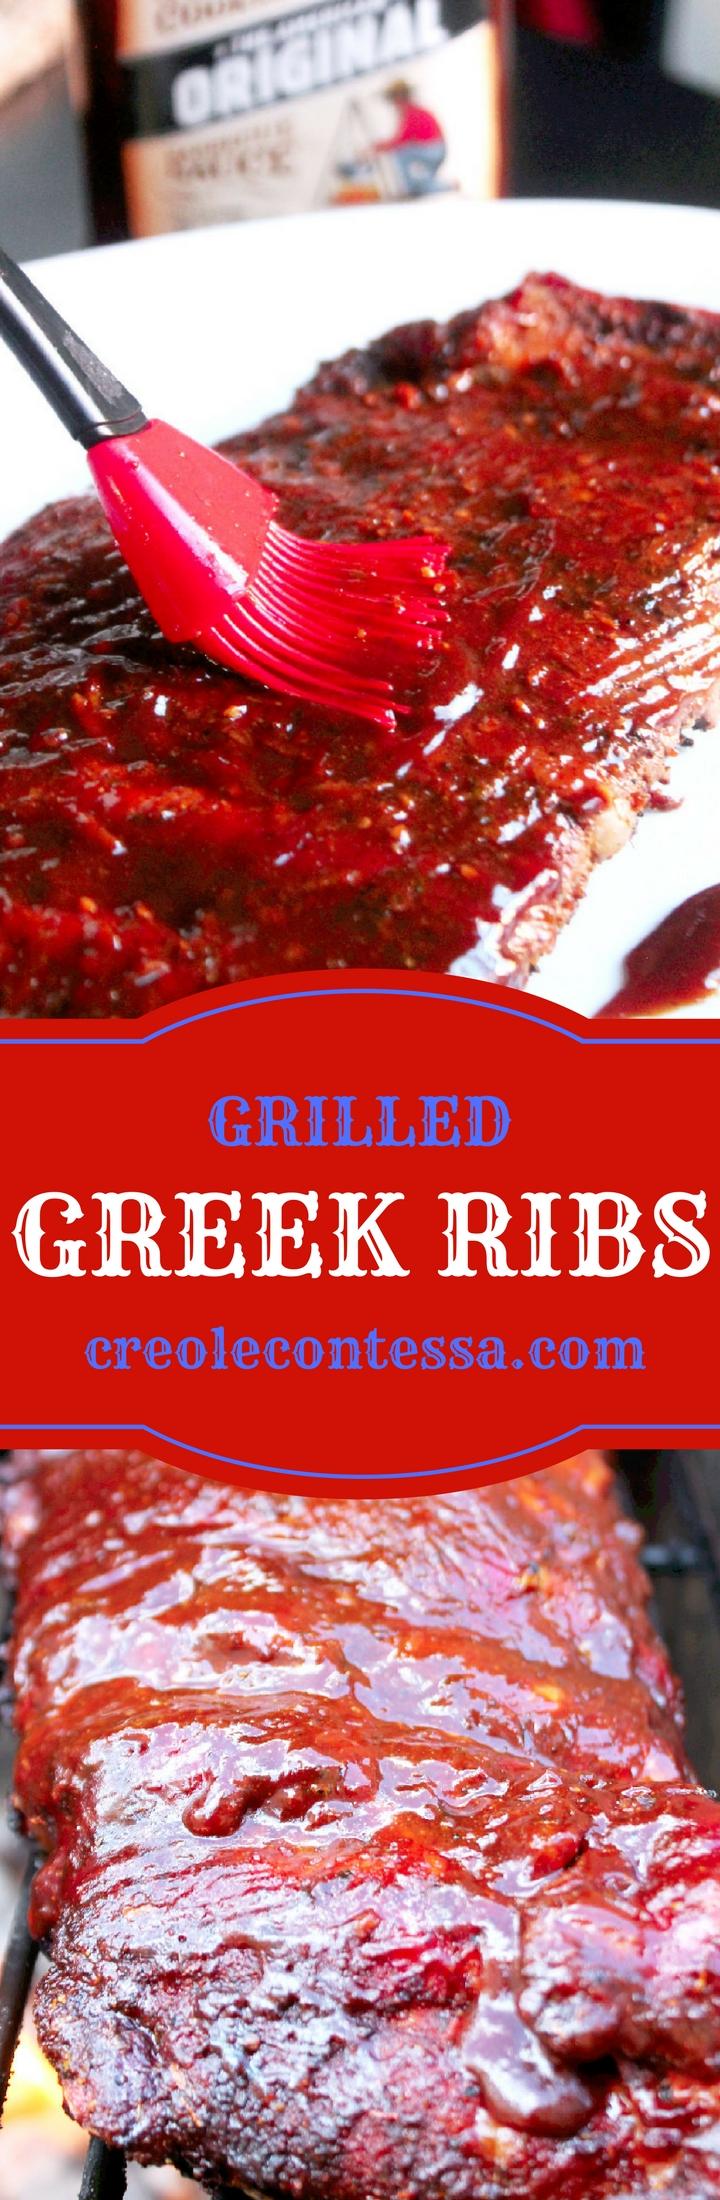 Grilled Greek Ribs-Creole Contessa